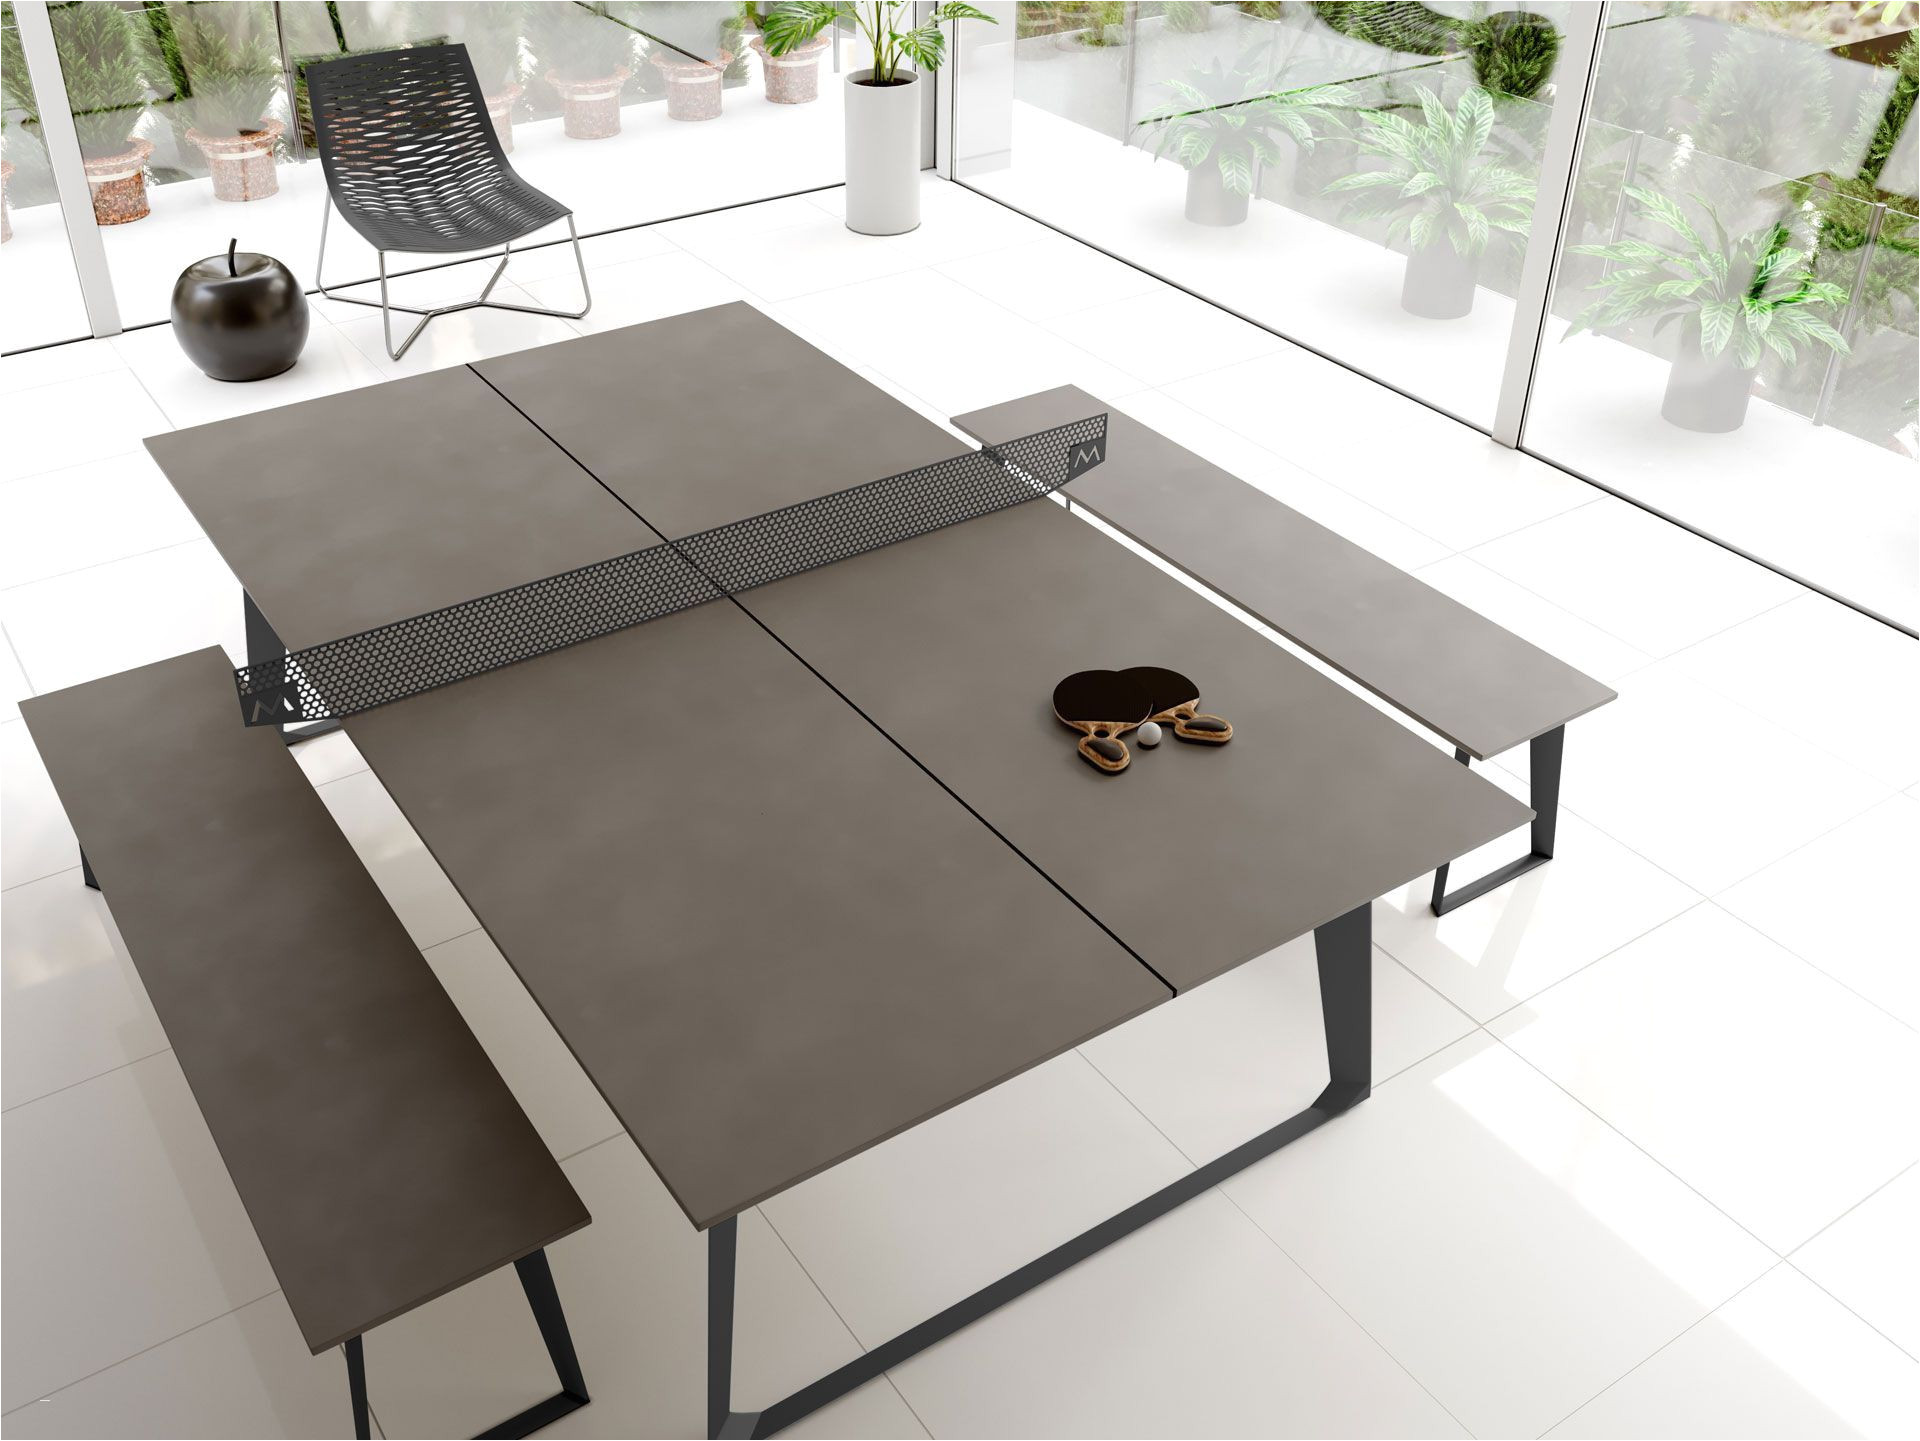 outdoor concrete dining table best of modloft amsterdam table tennis de ght pptblc od ficial store